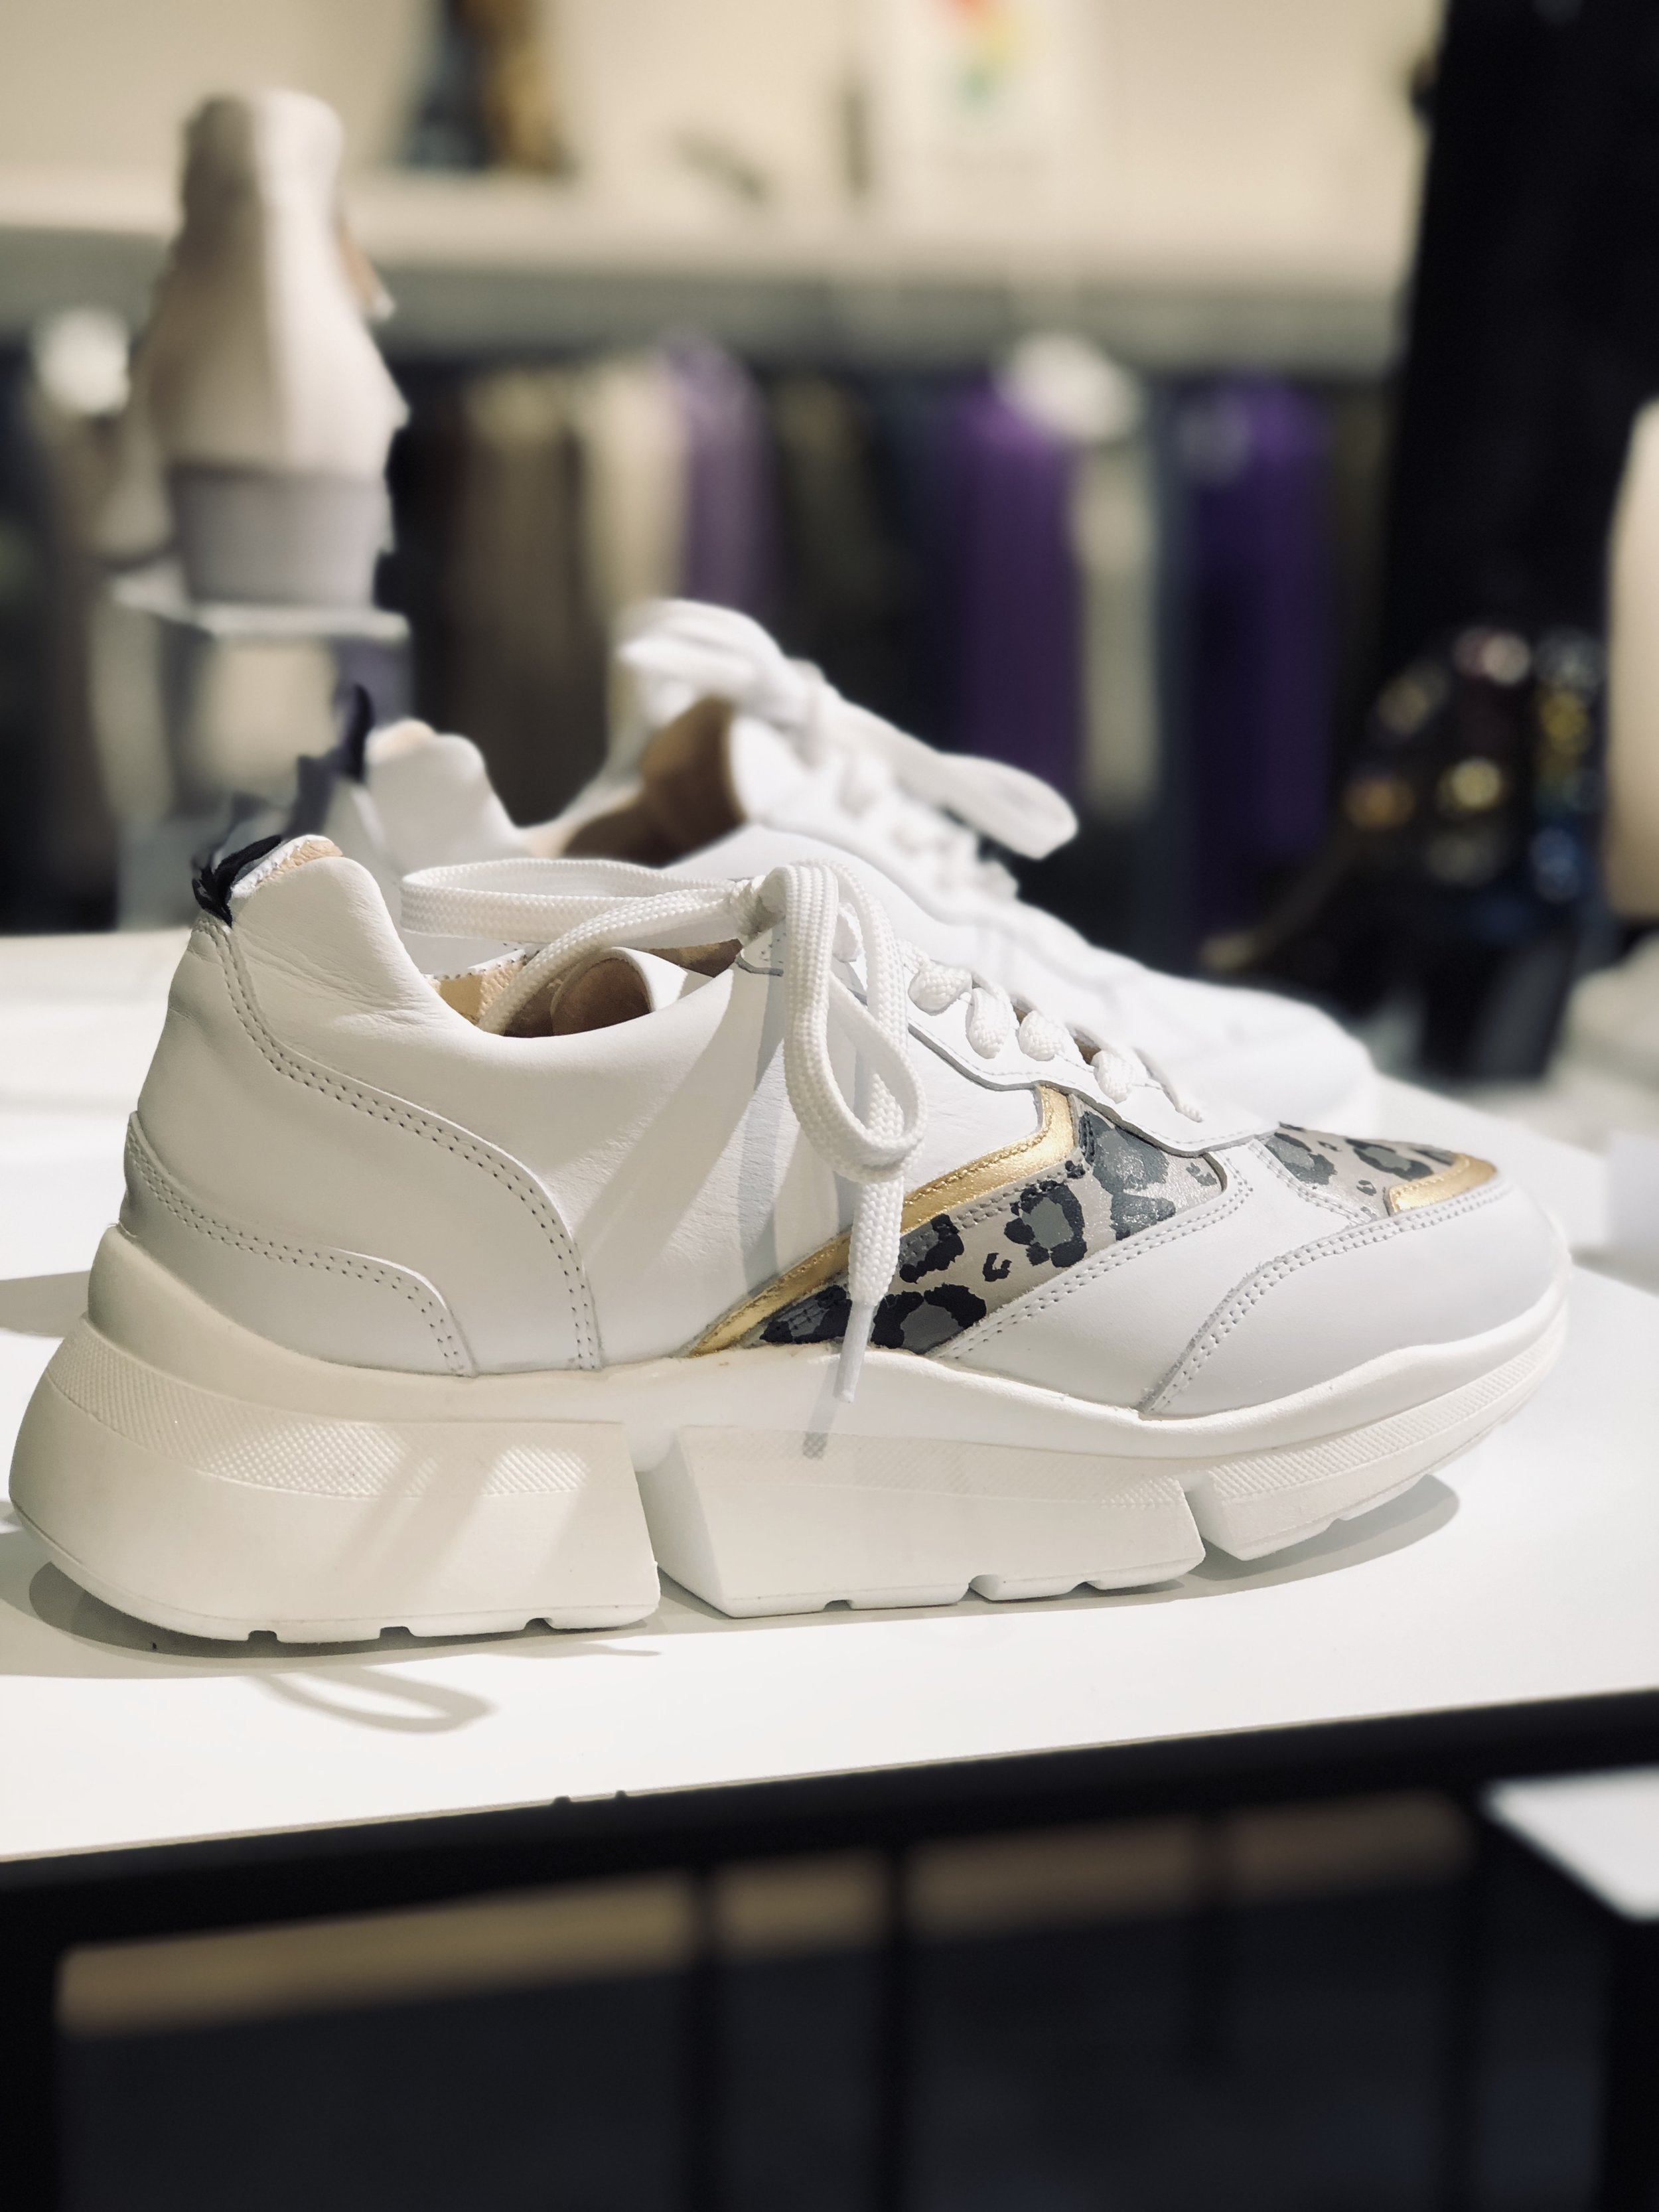 take your aim sneaker - Shop nu deze customized sneaker ontworpen door Aimée!